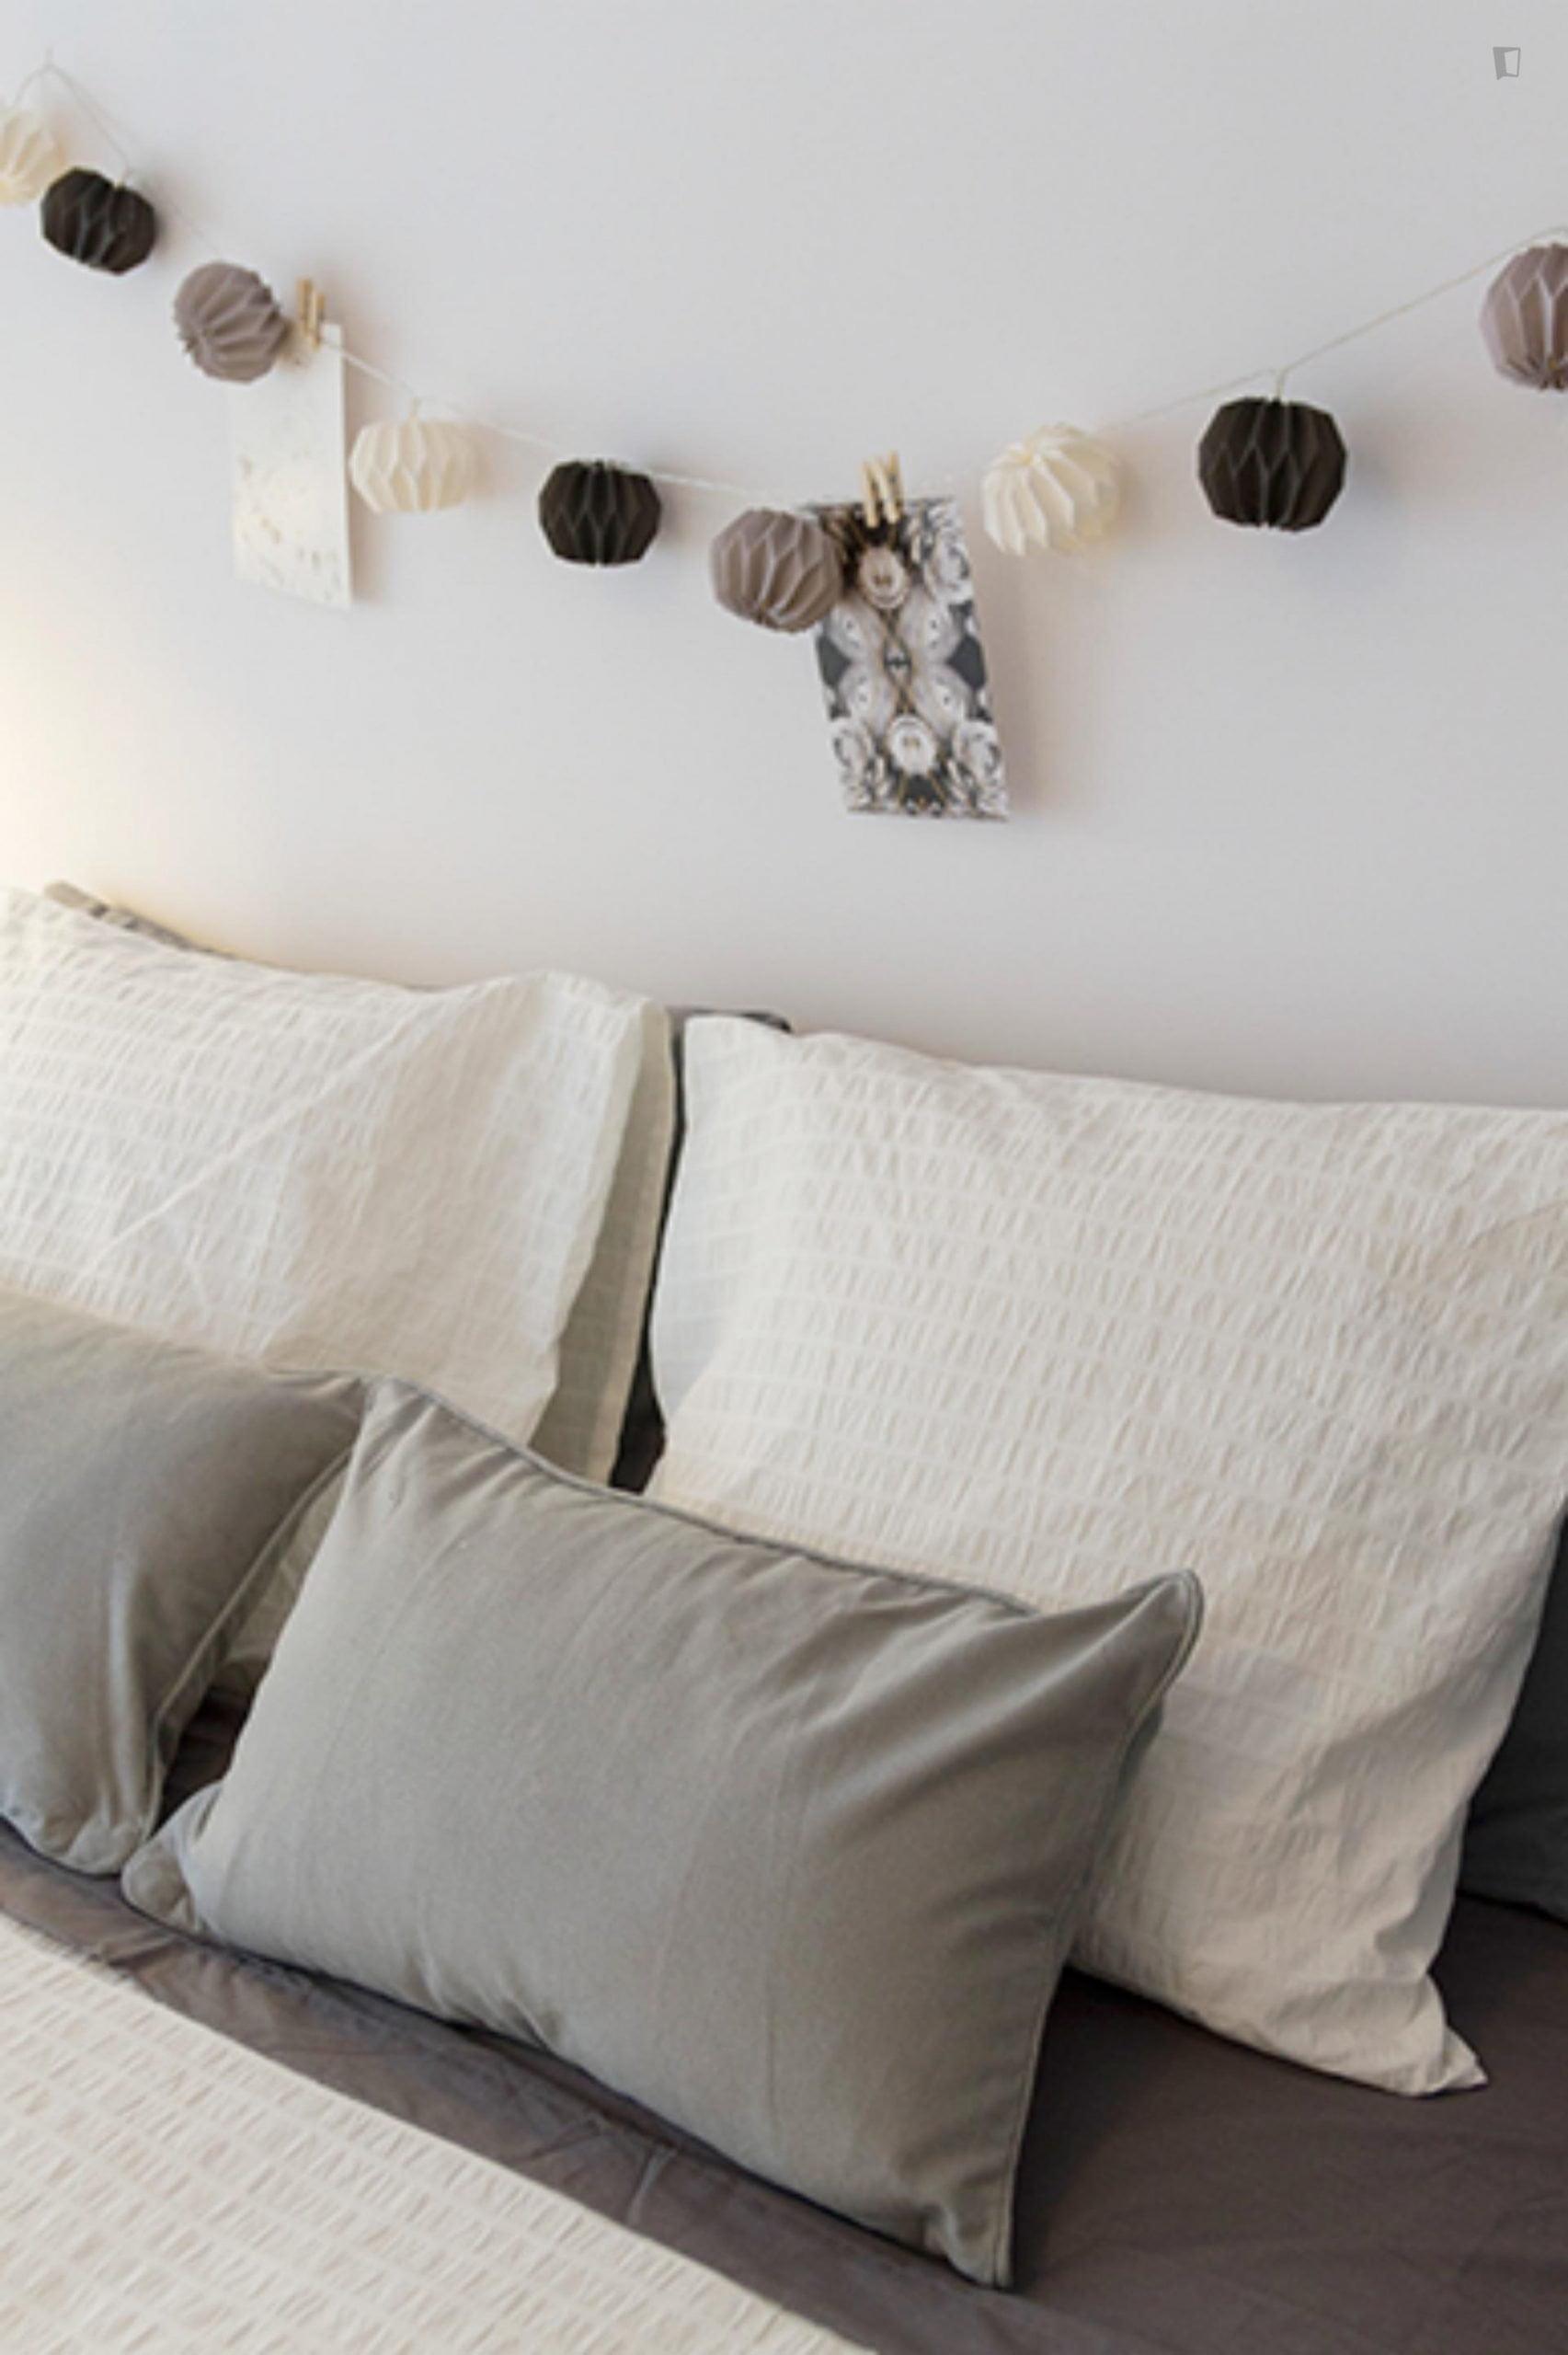 Kalea 19- Elegant Room in shared flat